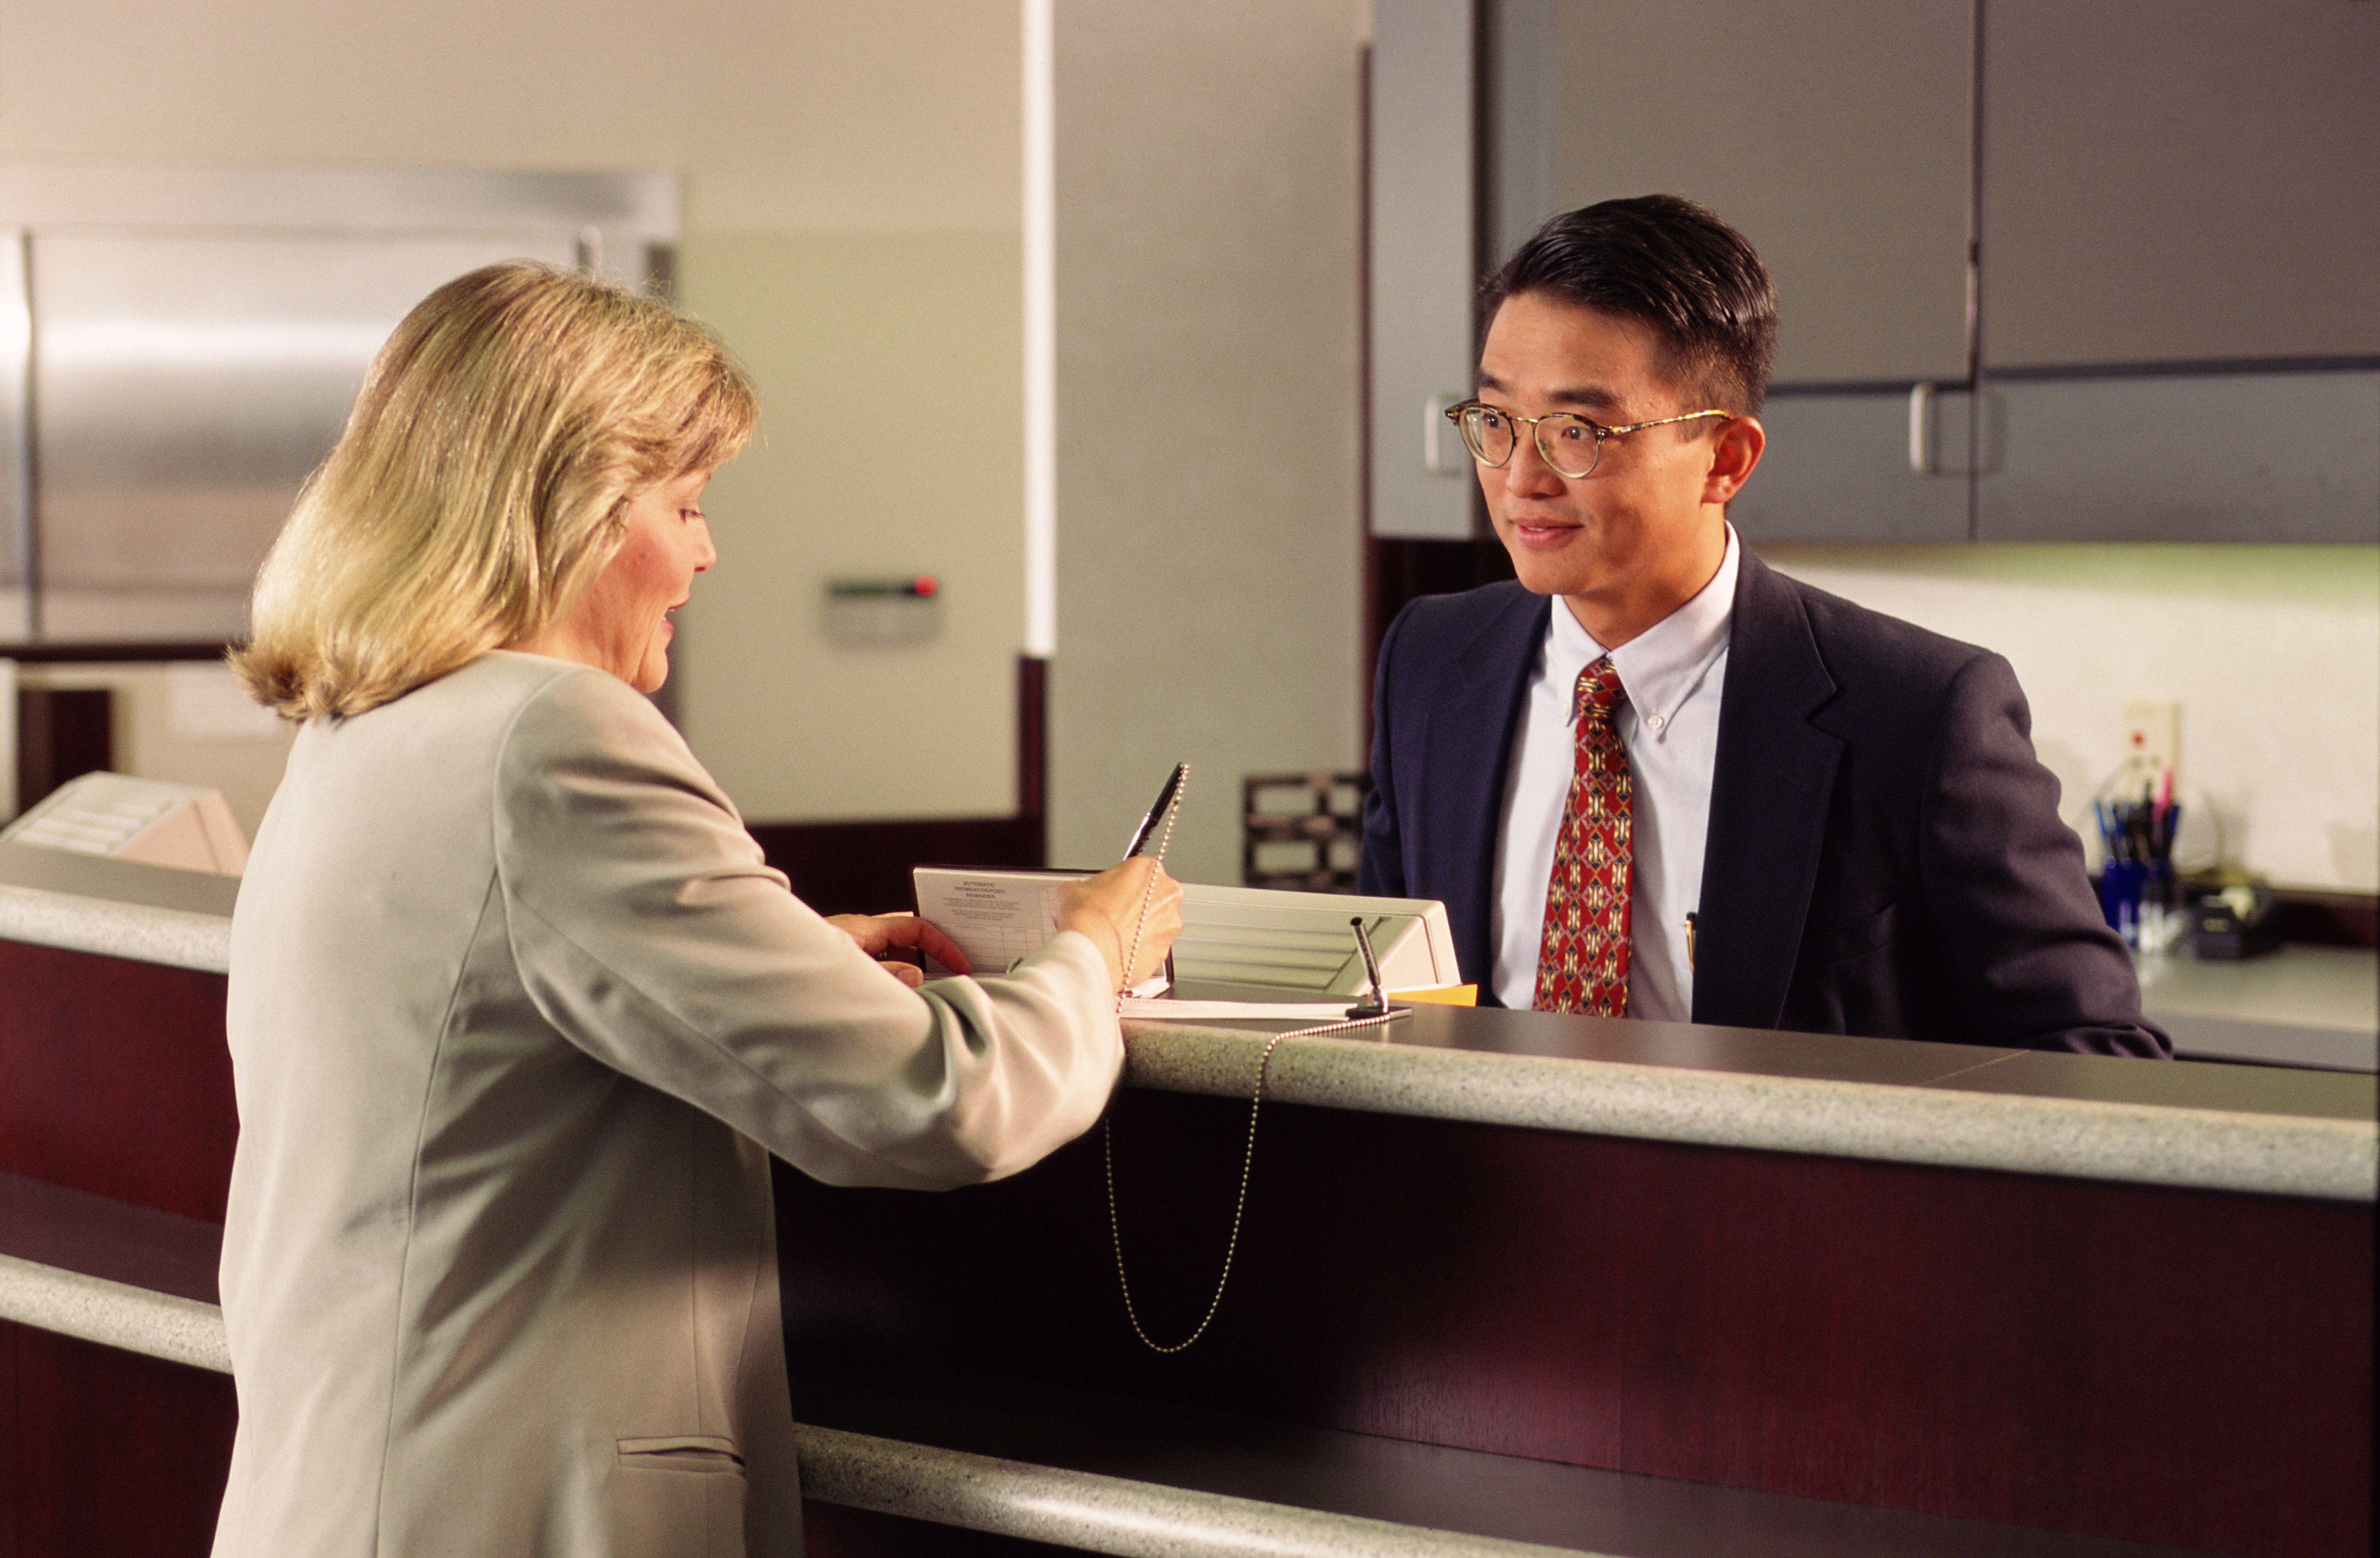 Bank Teller Job Description, Salary, and Skills